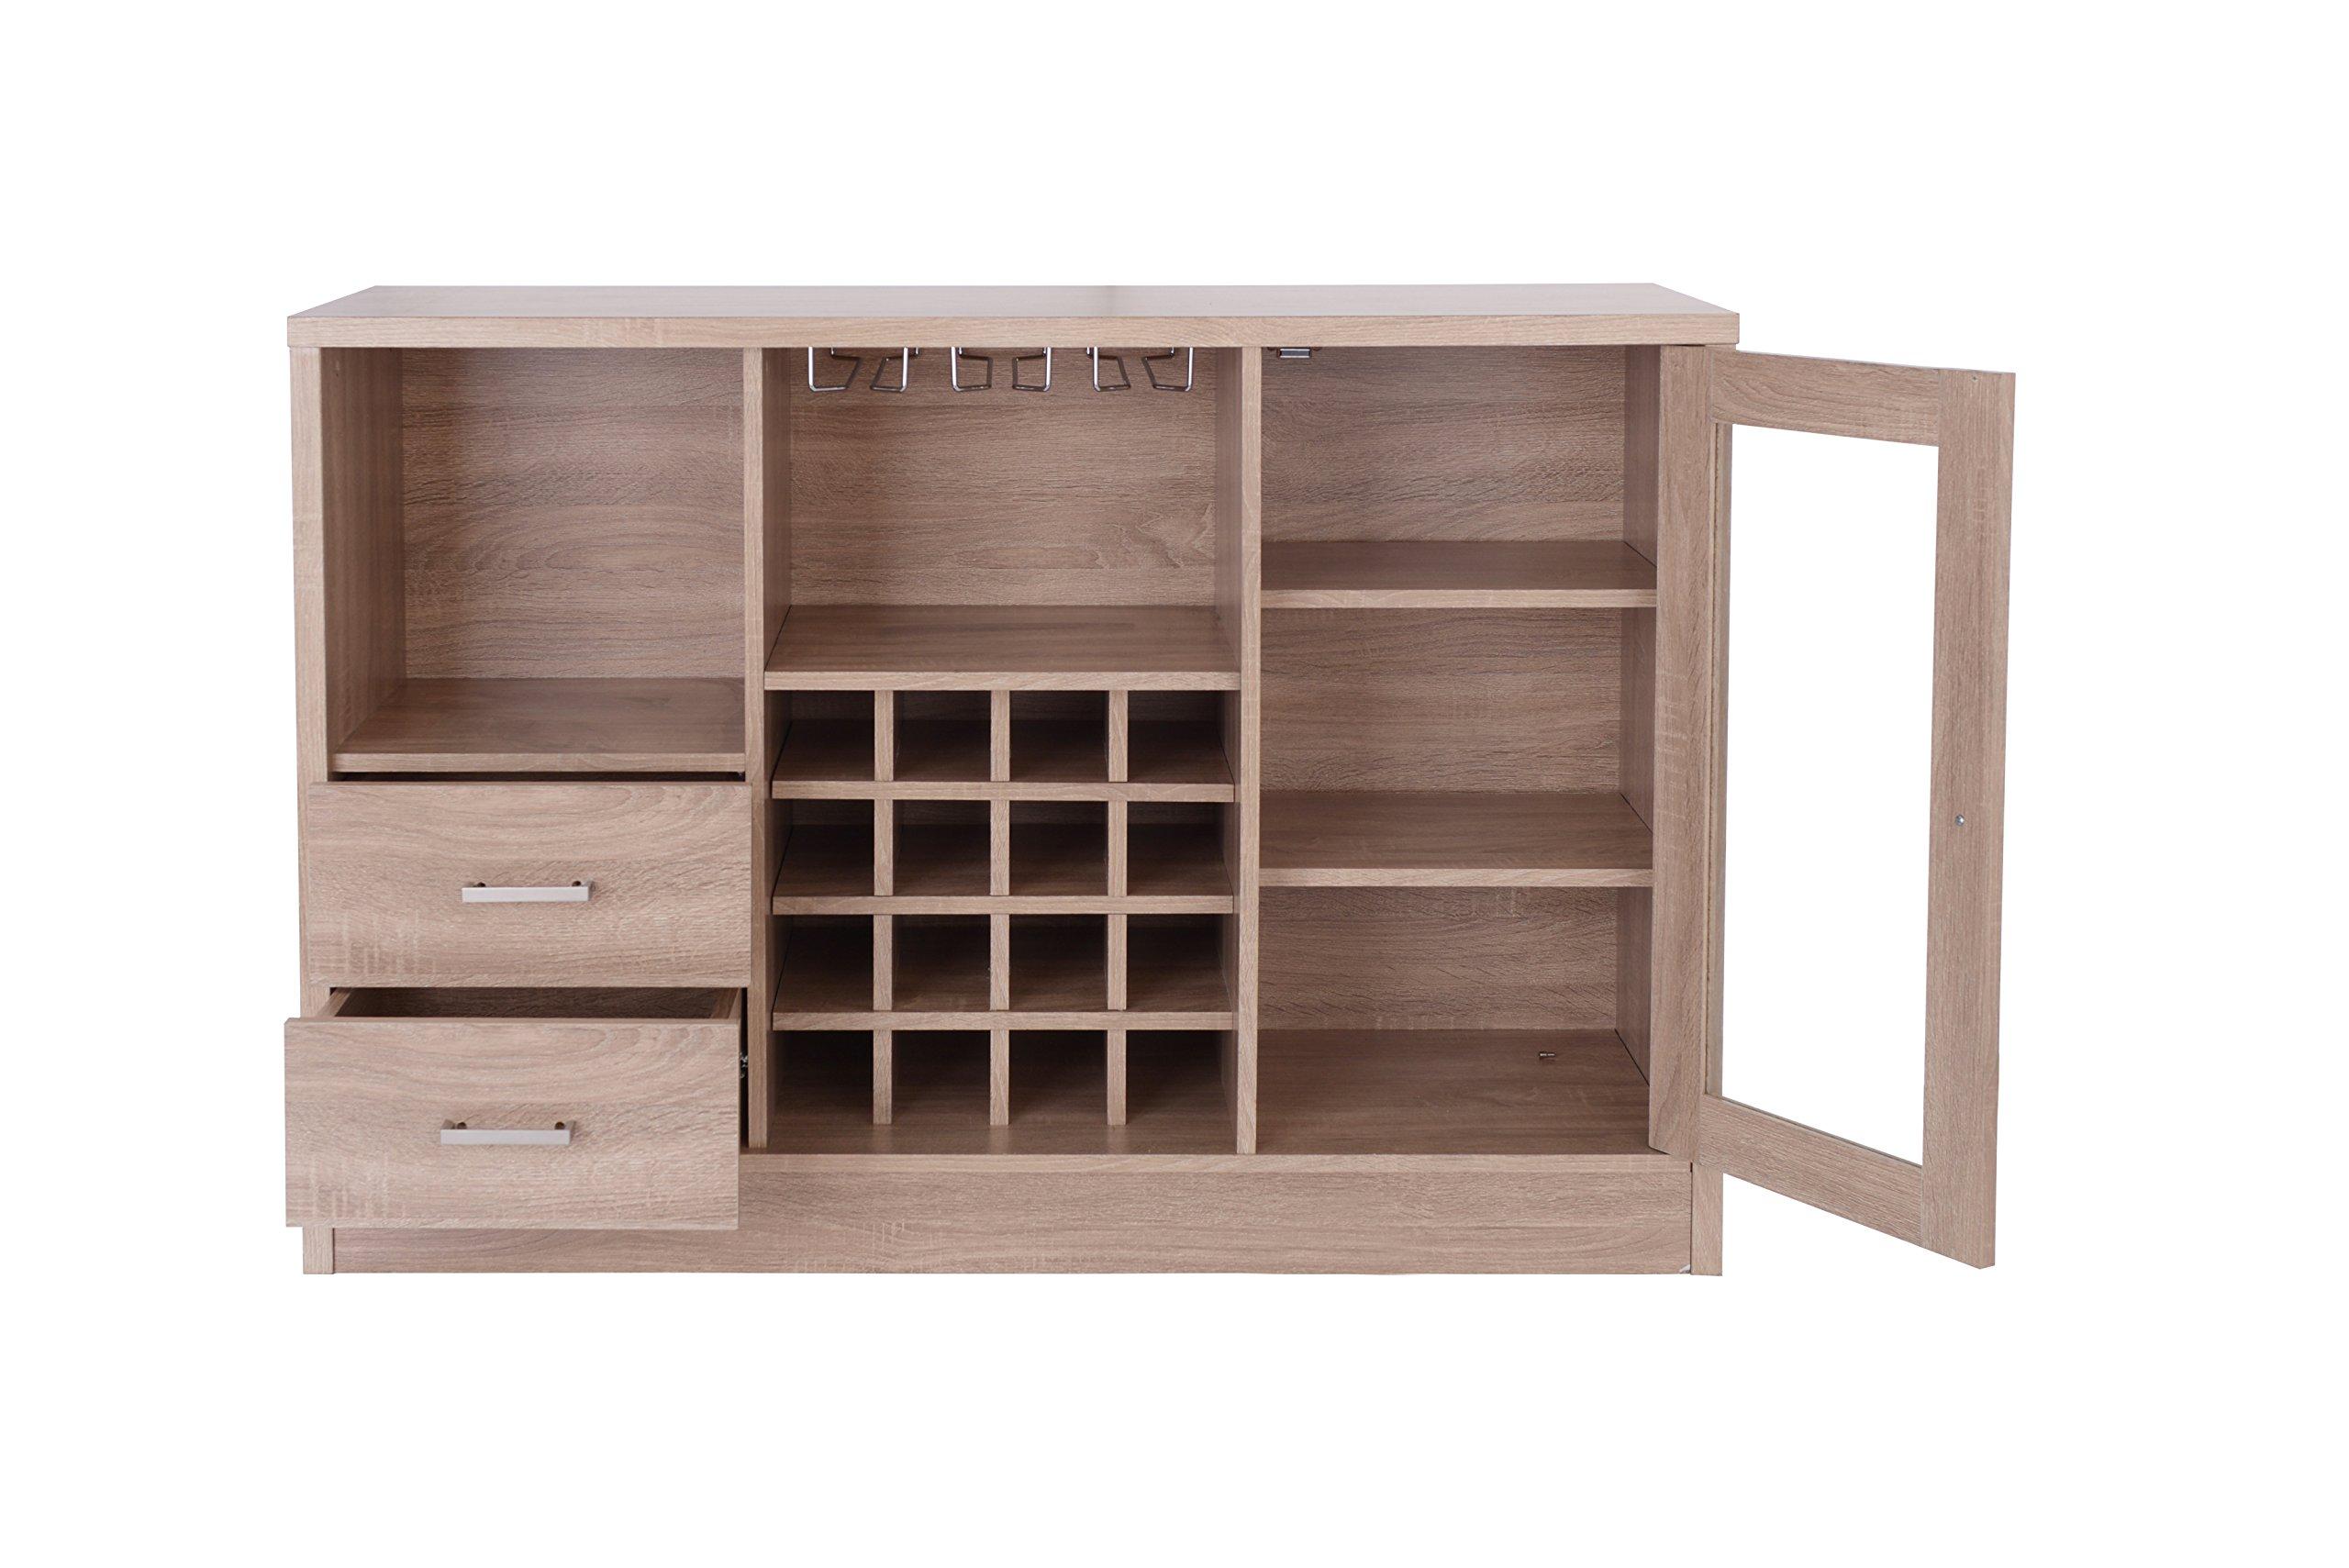 Acme Furniture 72635 Joice Rustic Oak Server by Acme Furniture (Image #3)